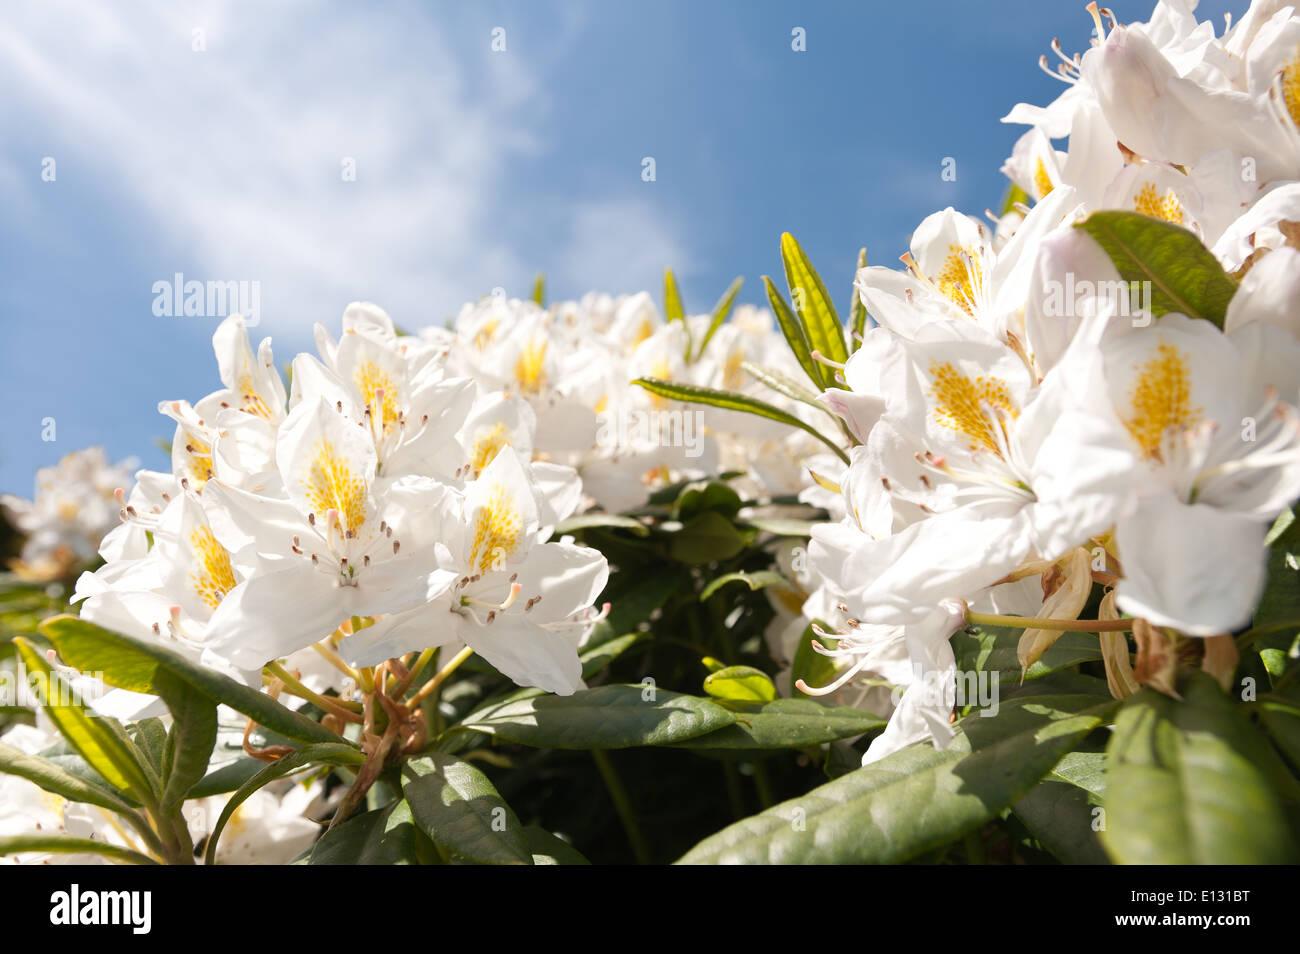 Abundant Masses Of Delicate Large Blossom Pale Cream White And